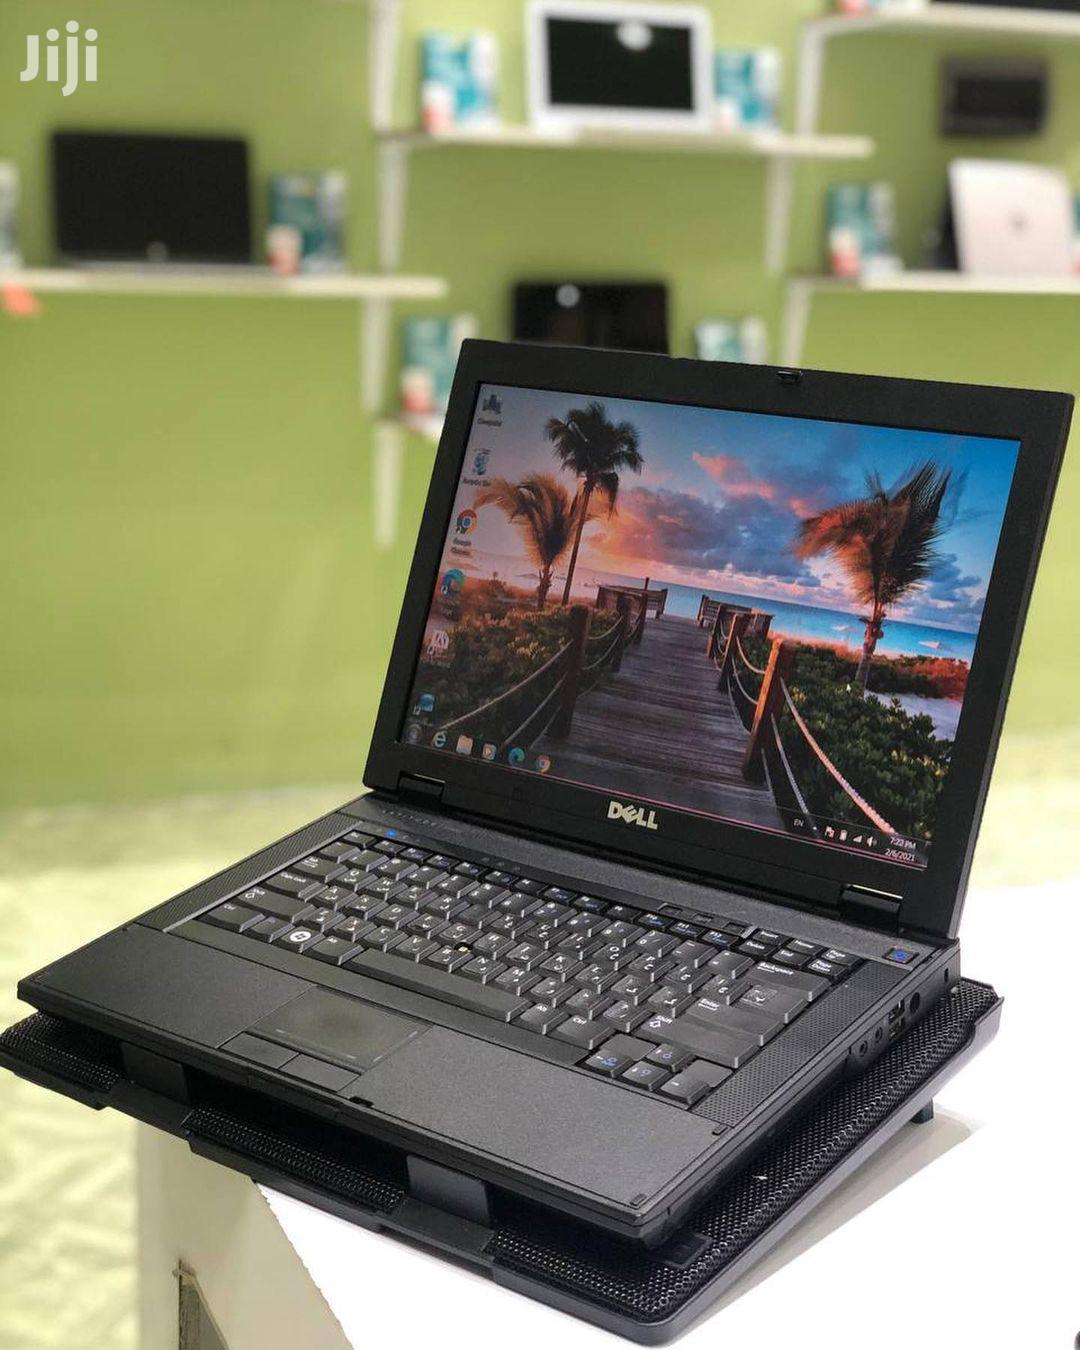 Laptop Dell Latitude E5400 2GB Intel Core 2 Duo HDD 160GB | Laptops & Computers for sale in Ilala, Dar es Salaam, Tanzania